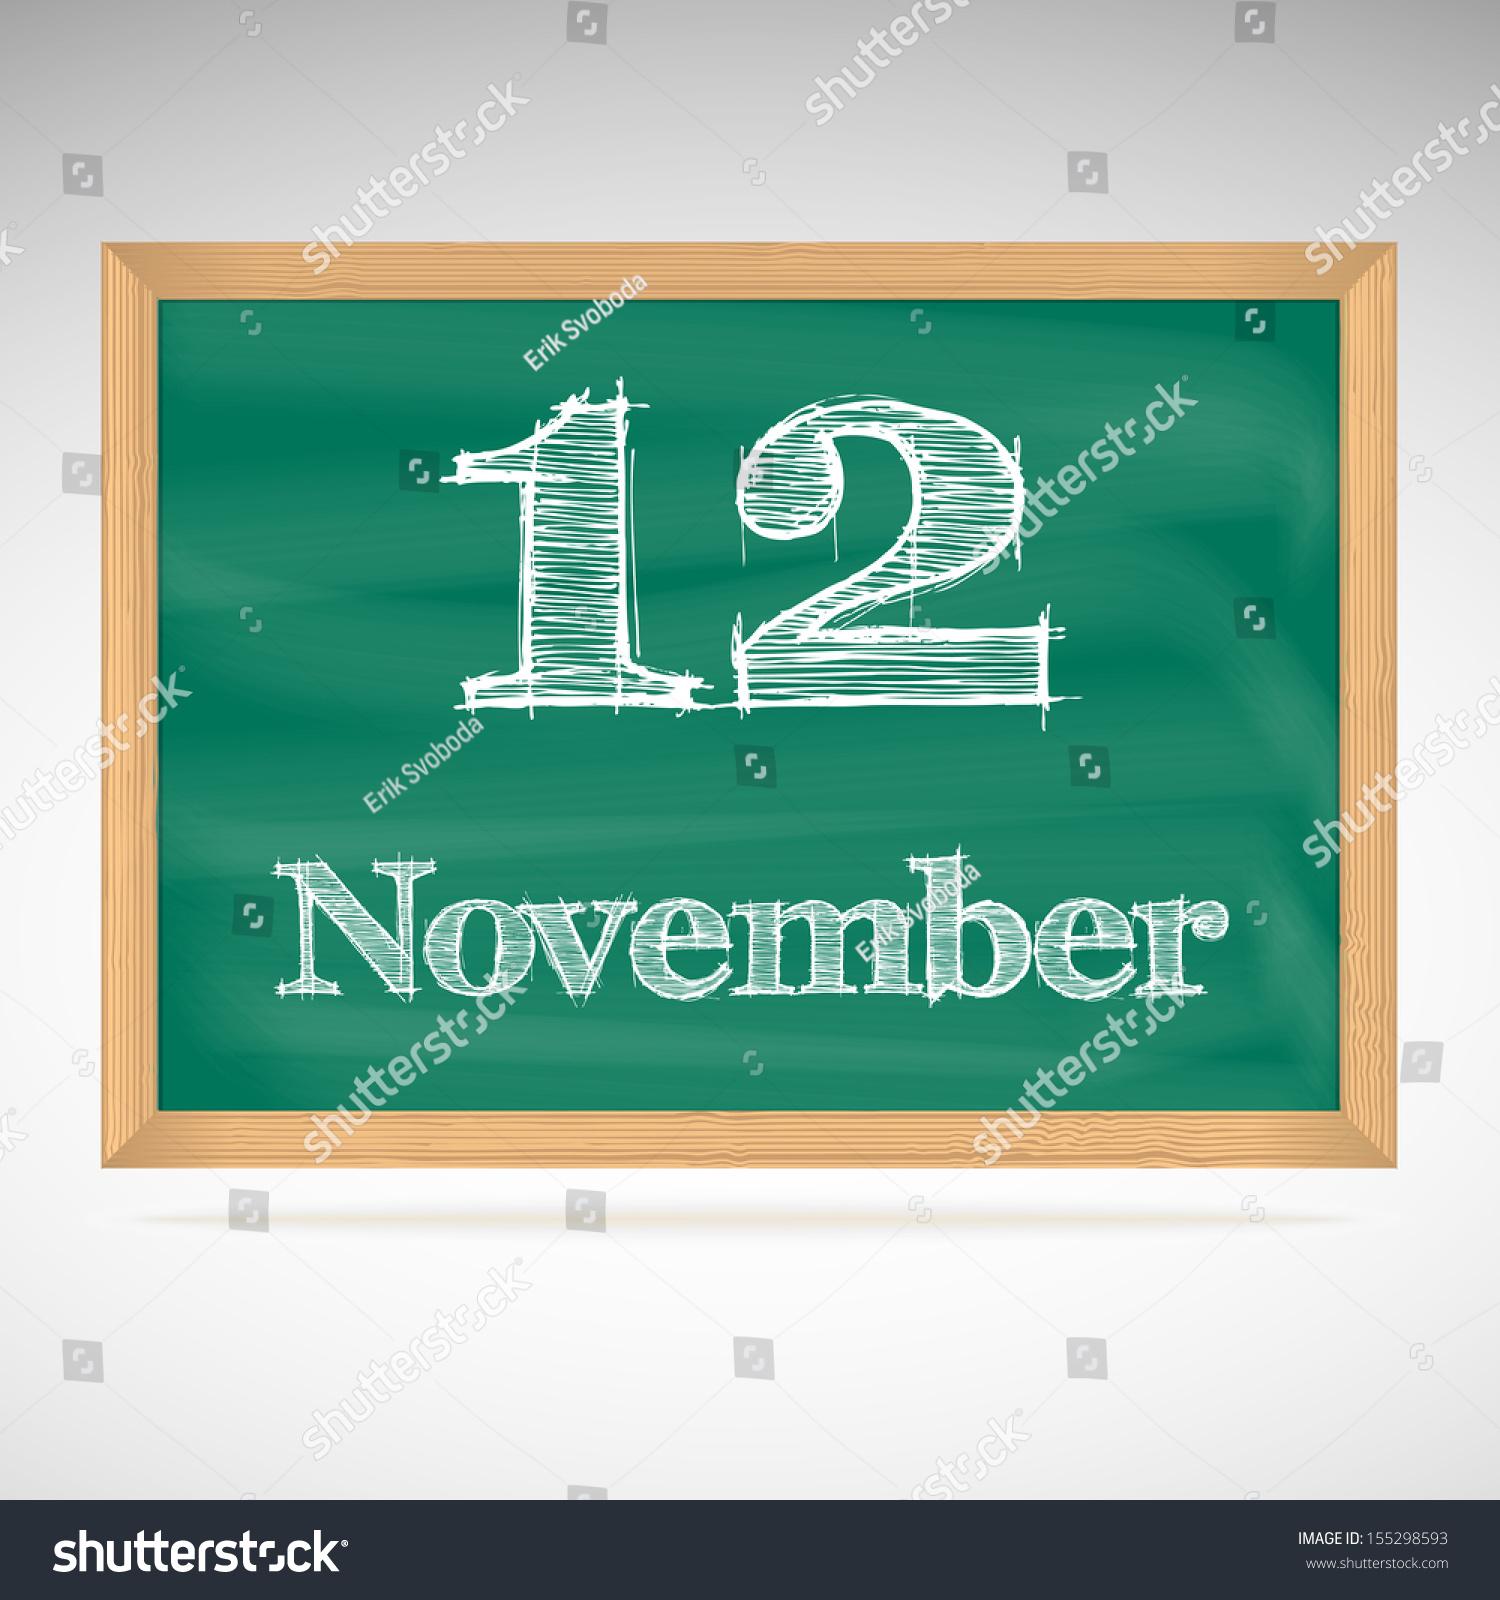 Calendar Illustration Board : November day calendar school board date stock vector